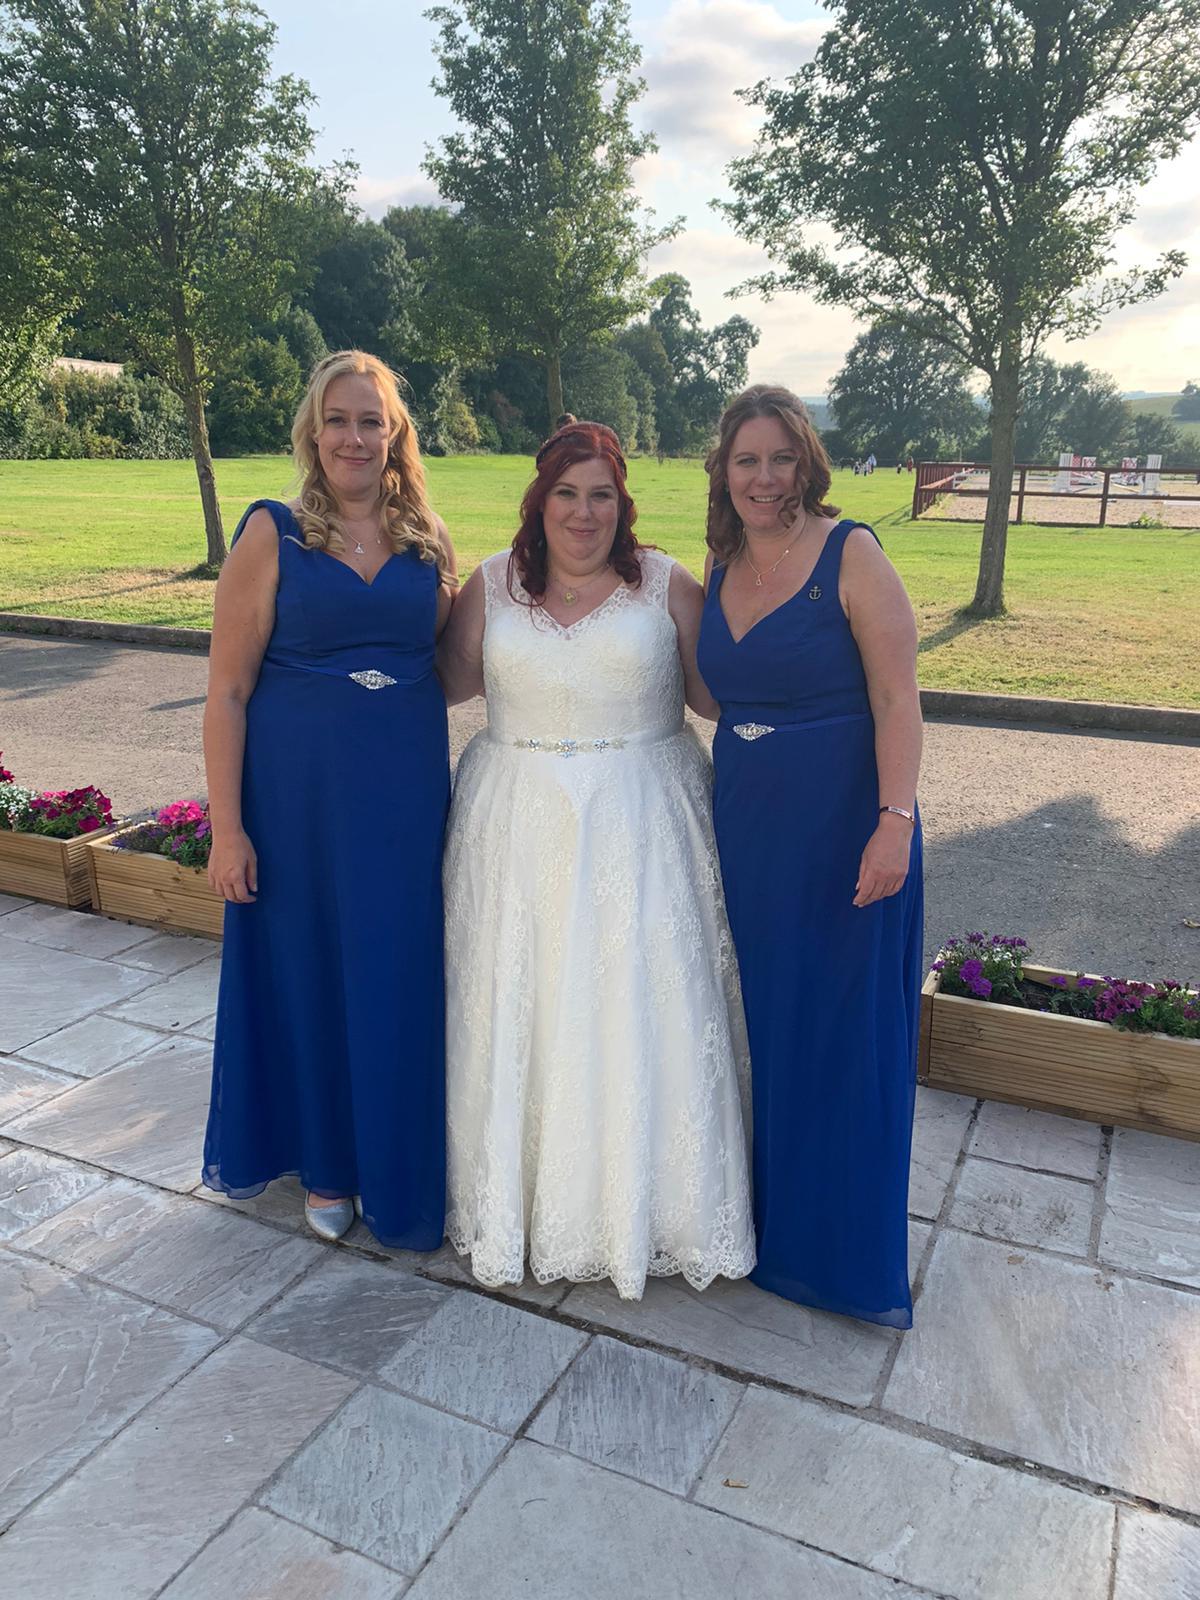 Elena Armitt with her bridesmaids